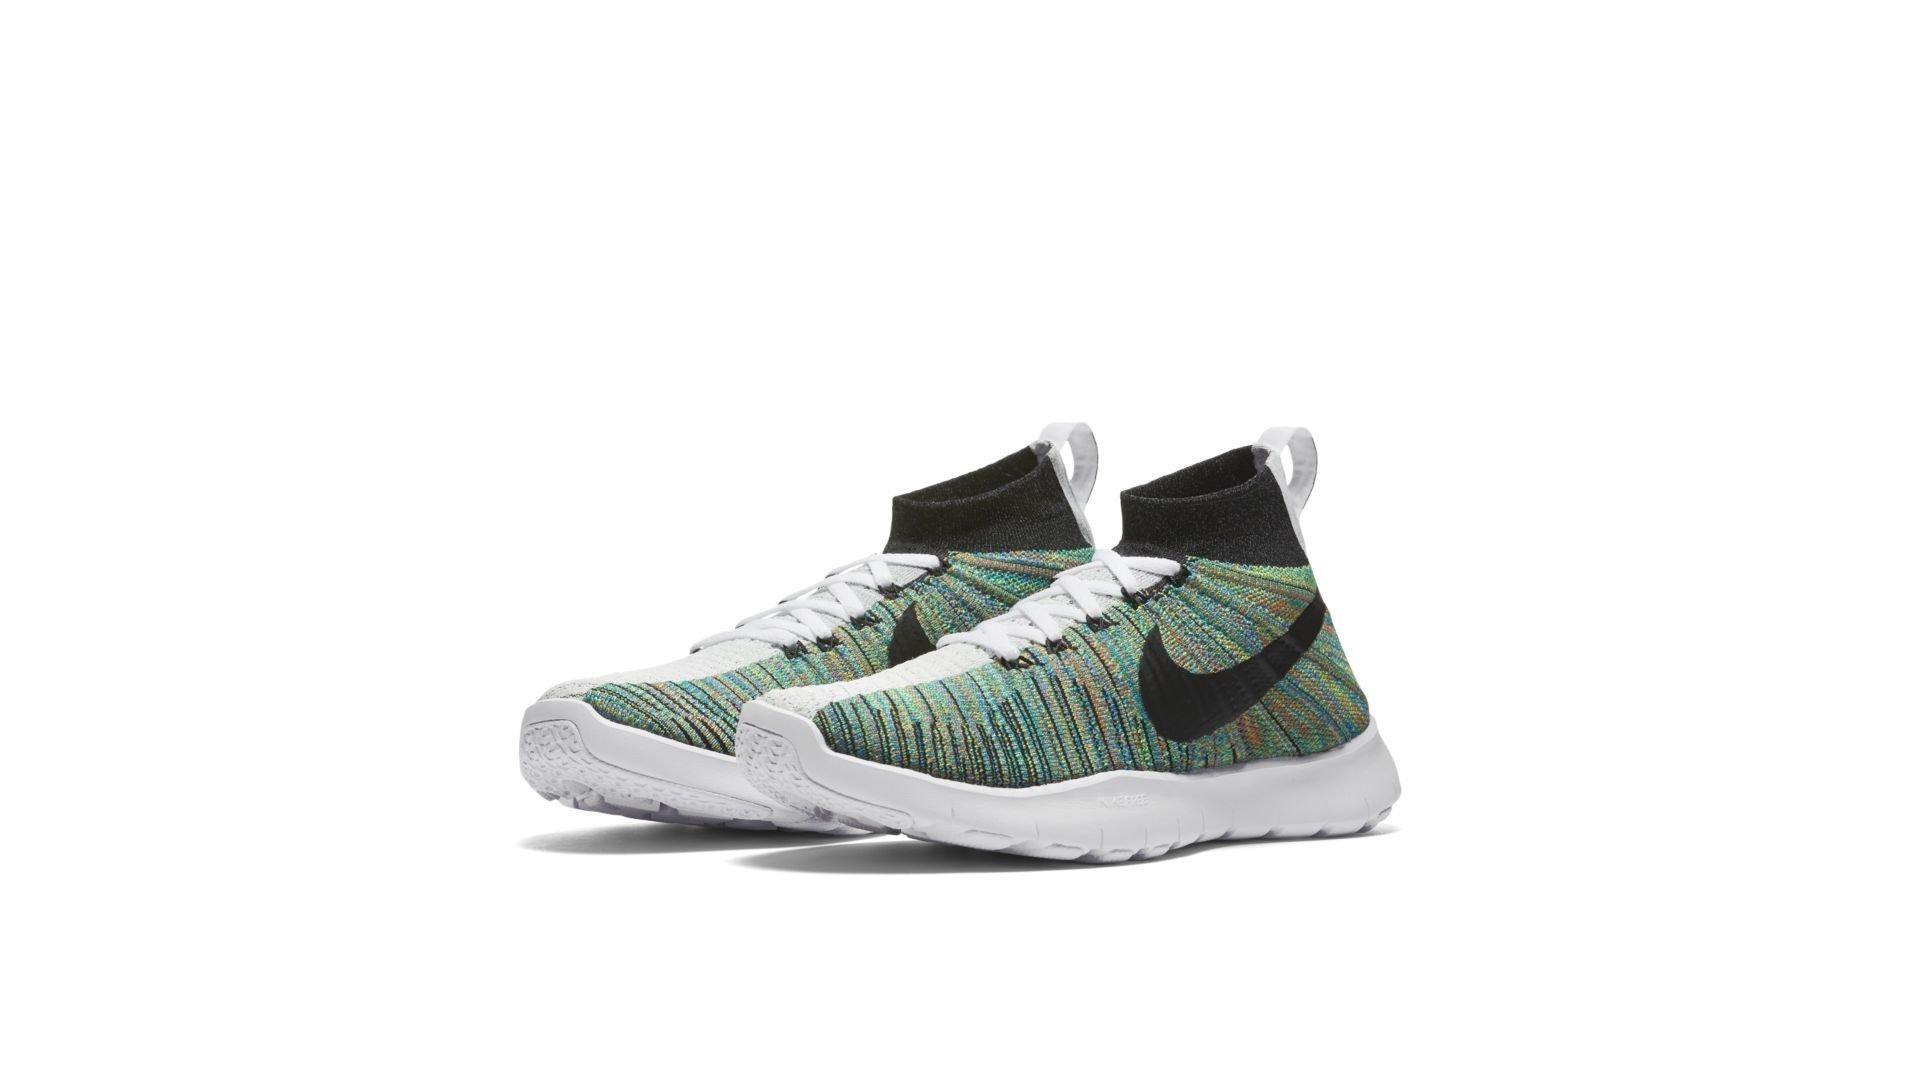 Nike Free Train Force Flyknit Tisci Multi-Color (844461-910)